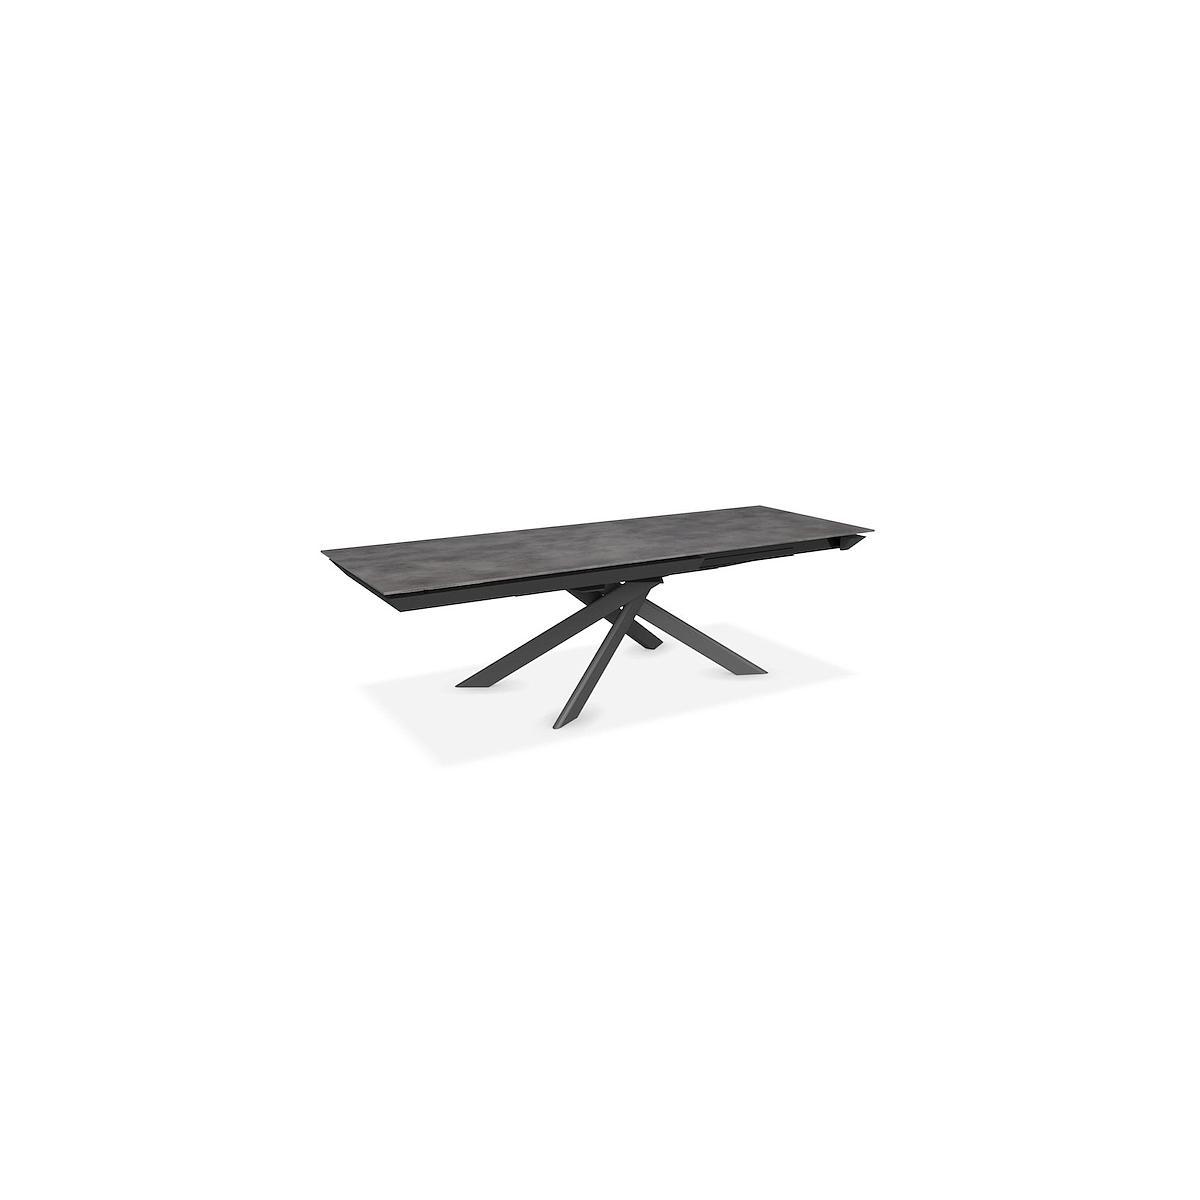 table rectangulaire extensible eclisse calligaris c ramique verre ciment abitare living. Black Bedroom Furniture Sets. Home Design Ideas